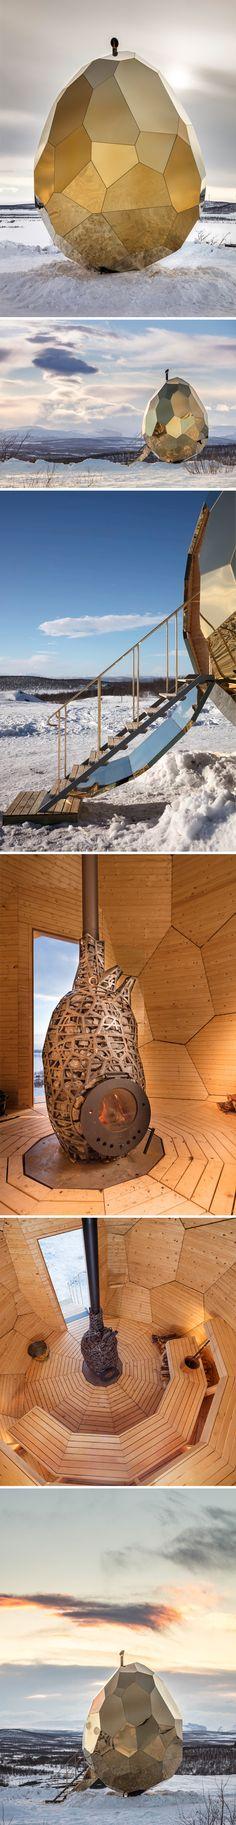 golden, solar, egg-shaped sauna in sweden by bigert & bergstrom